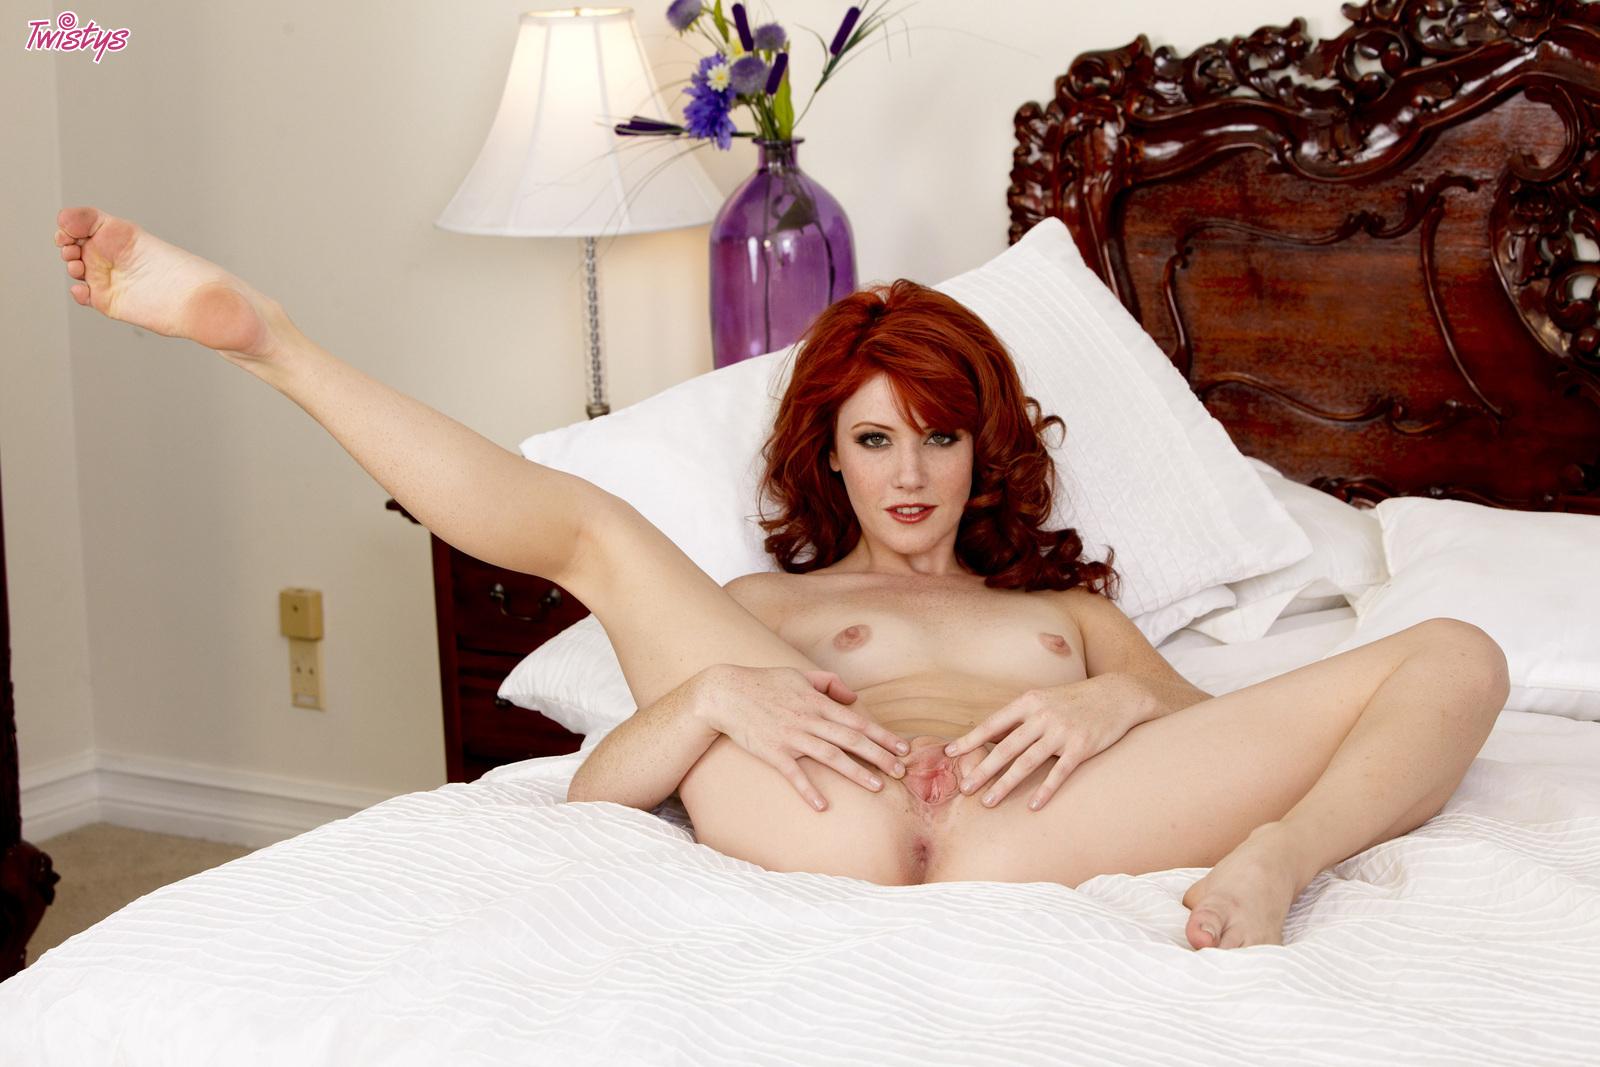 Elle Alexandra Nude Photos and Videos nudes (25 pics)